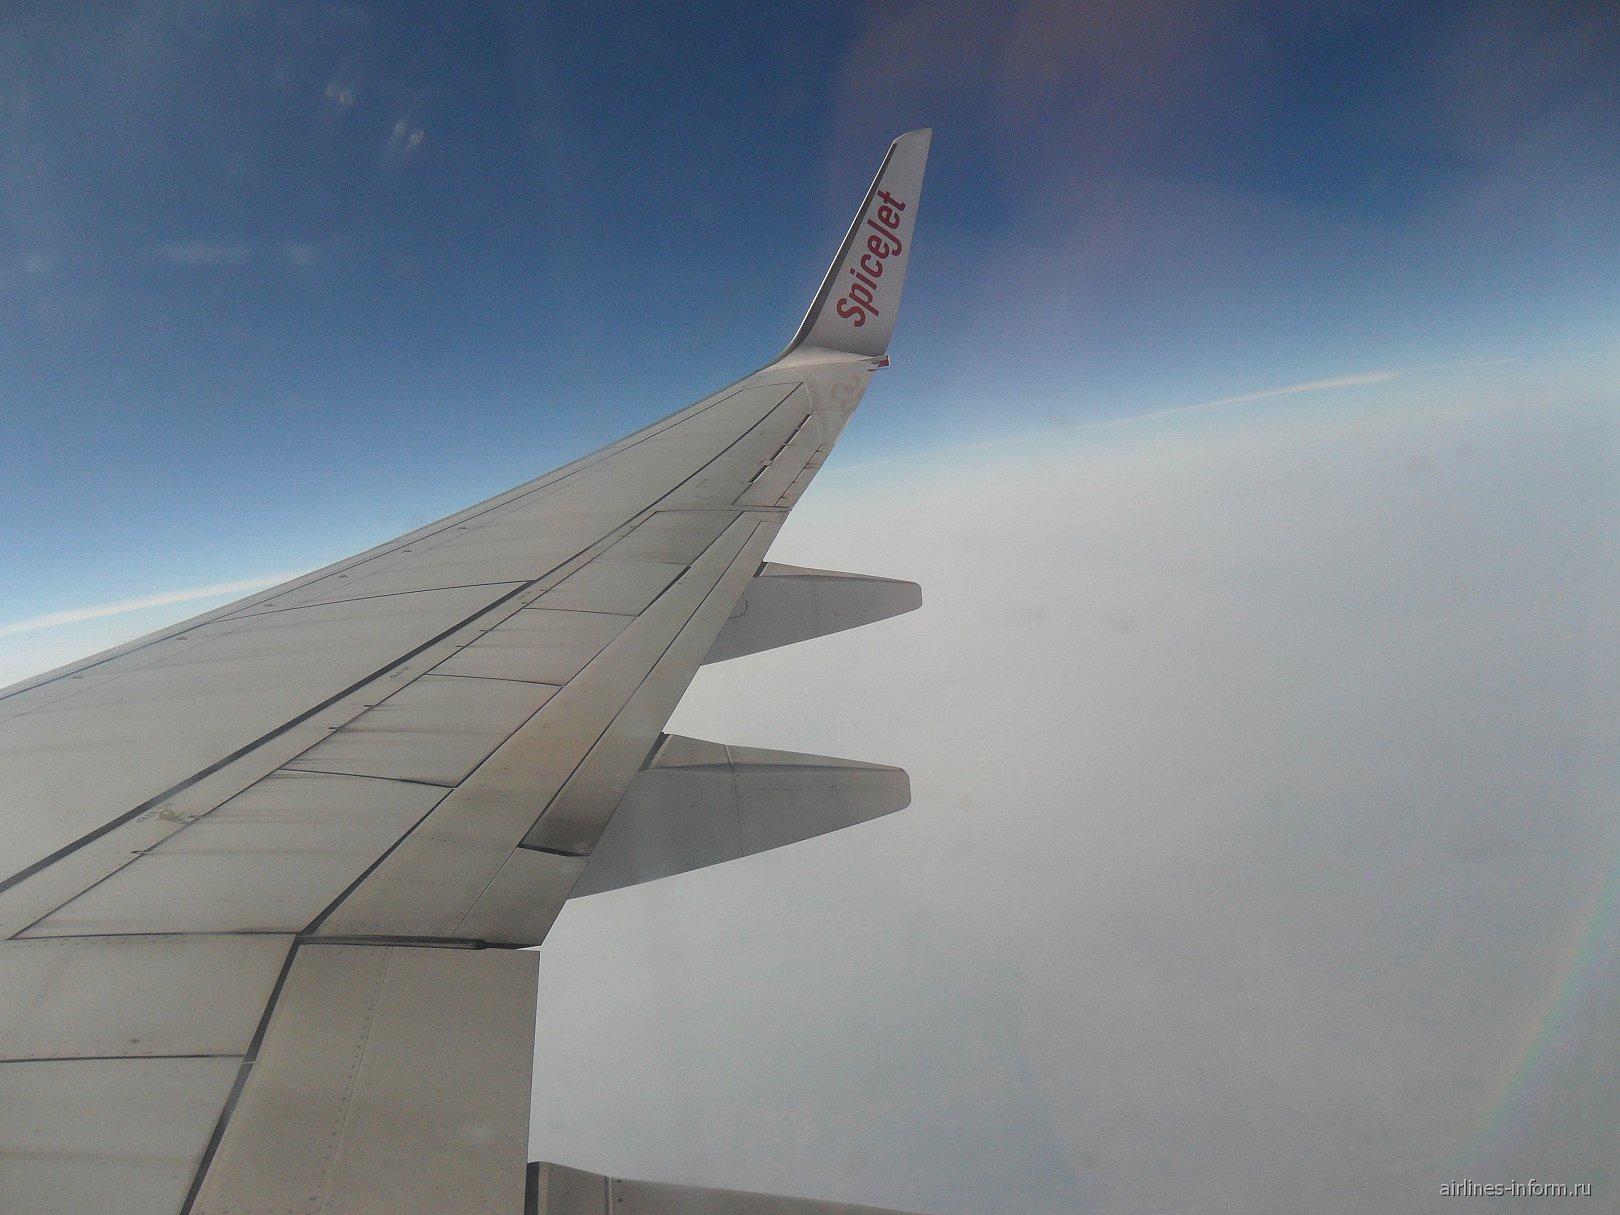 Рейс Дели-Варанаси авиакомпании SpiceJet